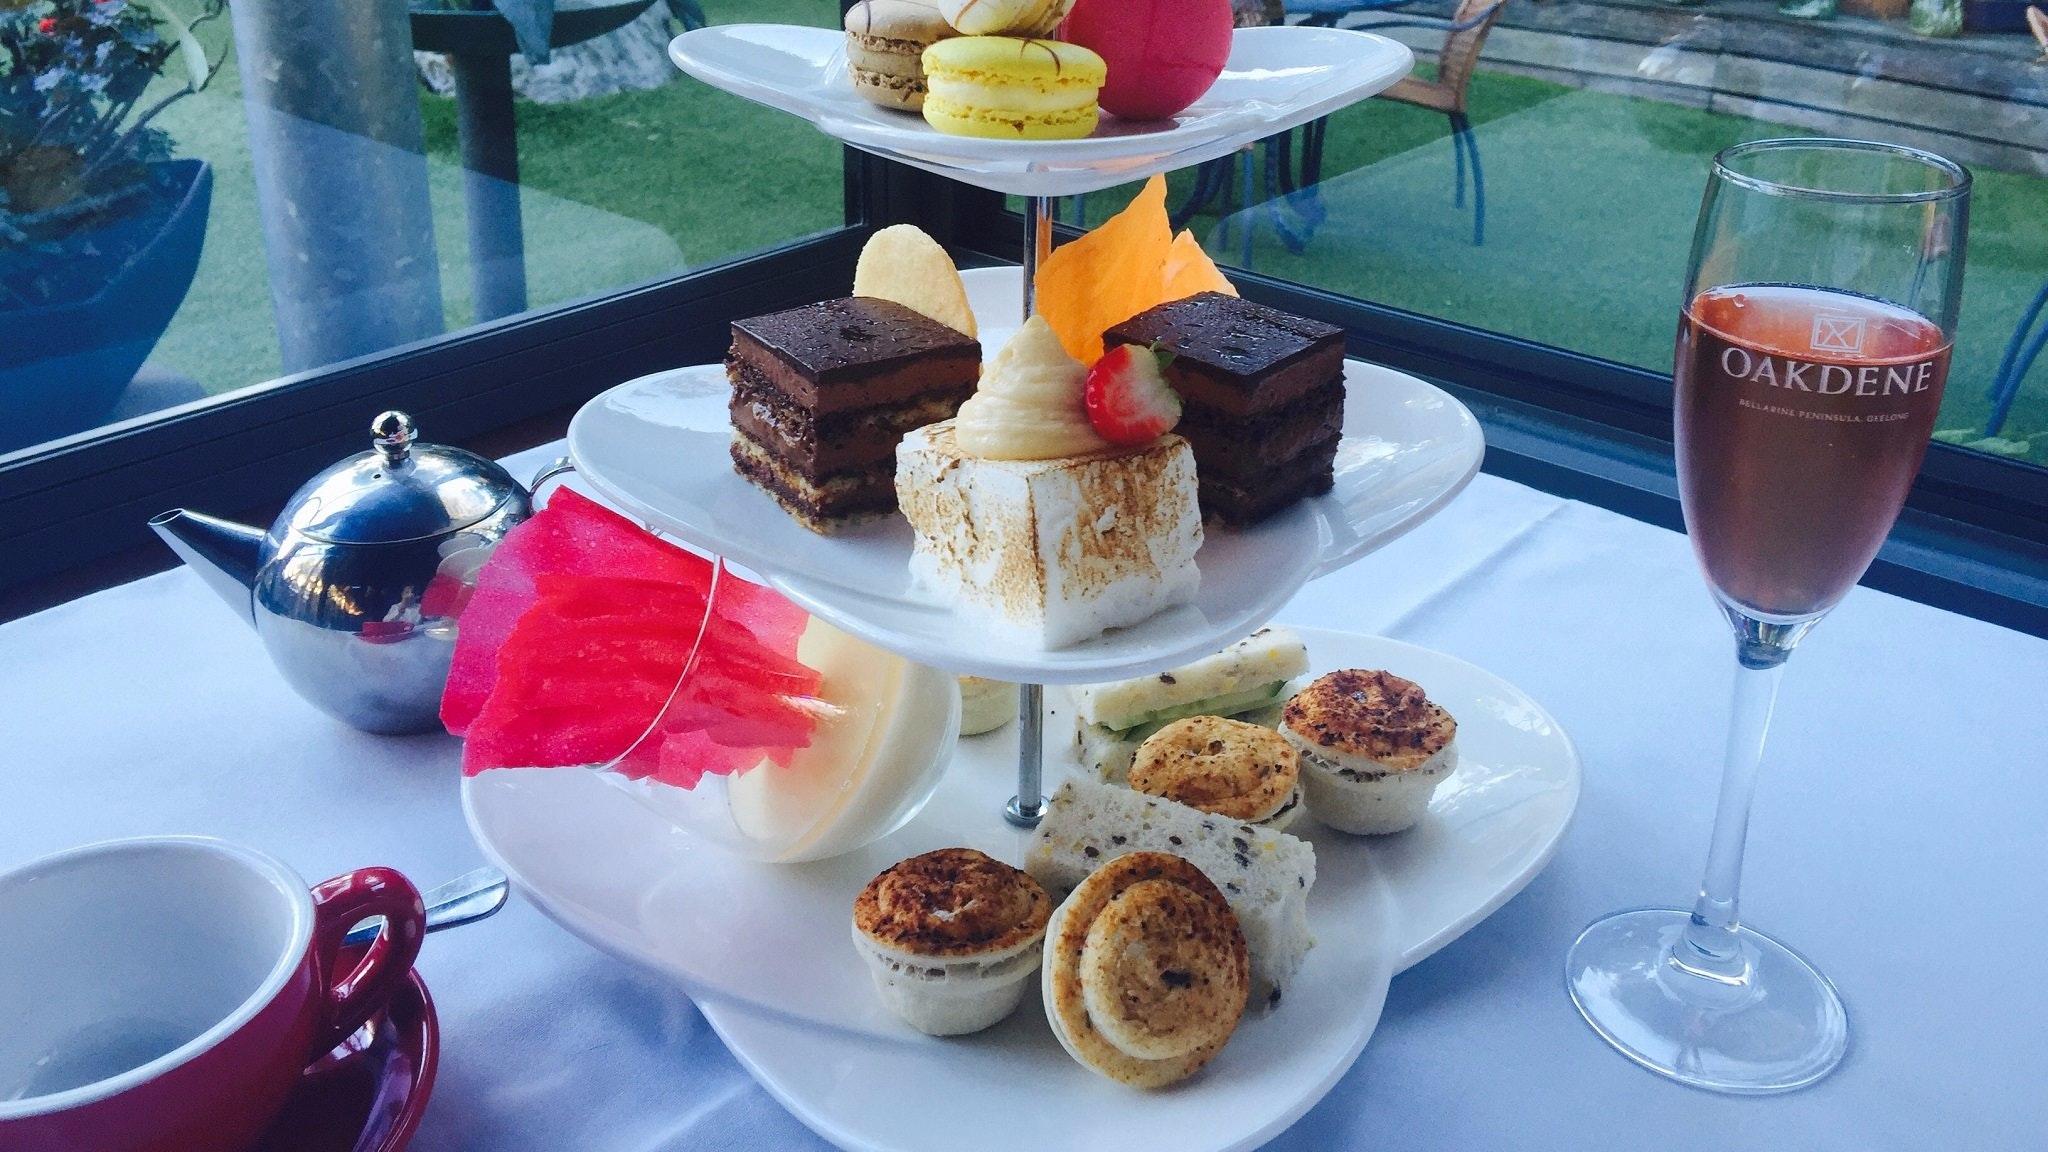 HIgh Tea on the Terrace at Oakdene